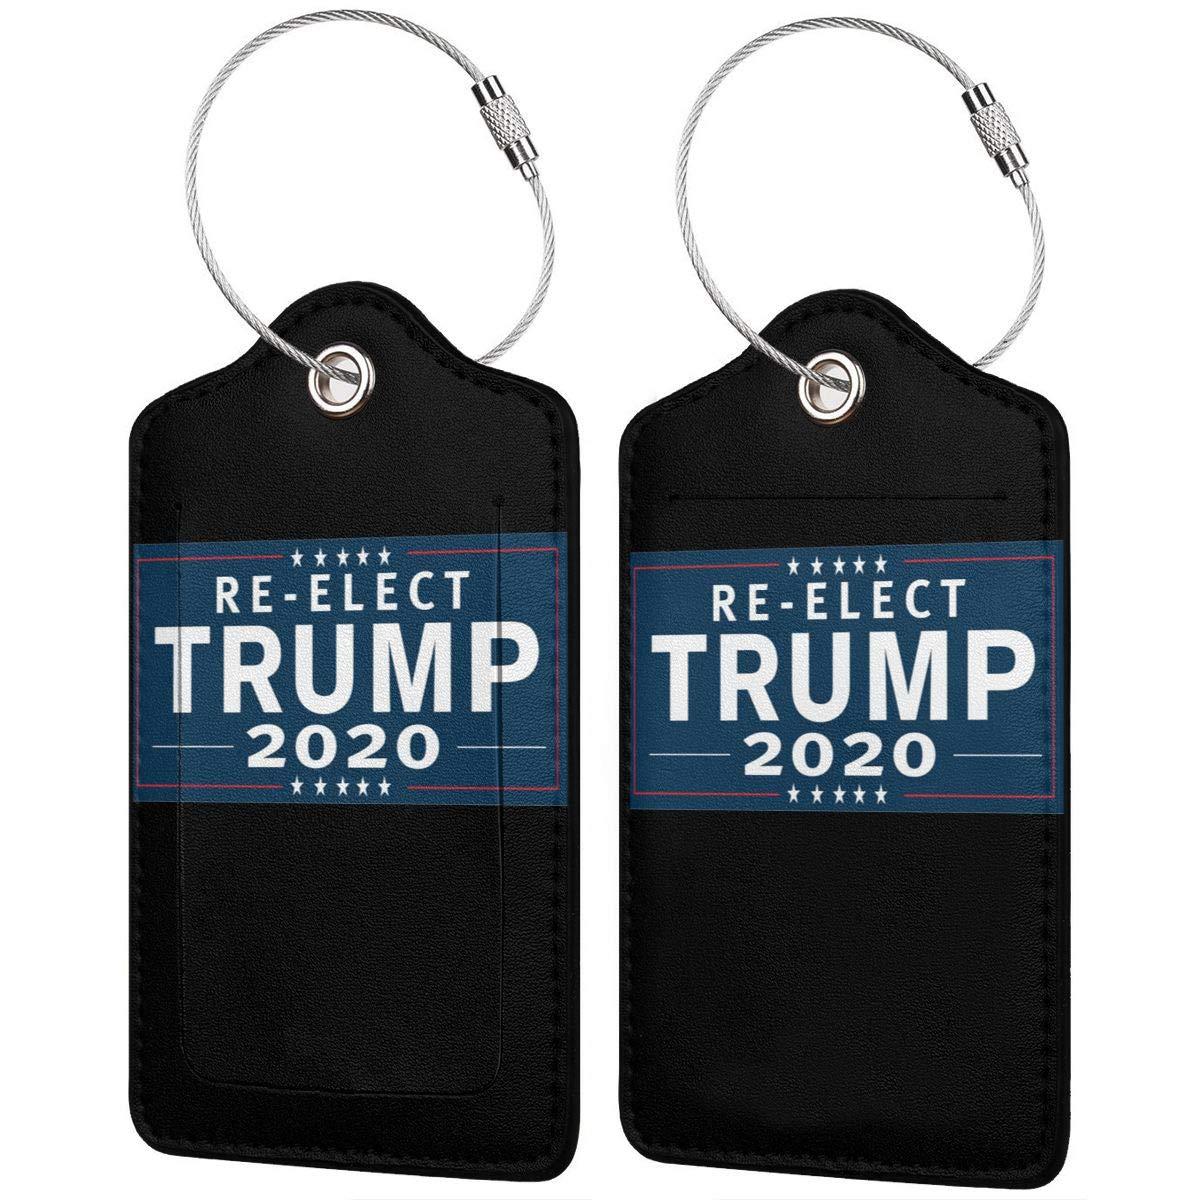 1pcs,2pcs,4pcs Trump 2020 Pu Leather Double Sides Print Luggage Tag Mutilple Packs